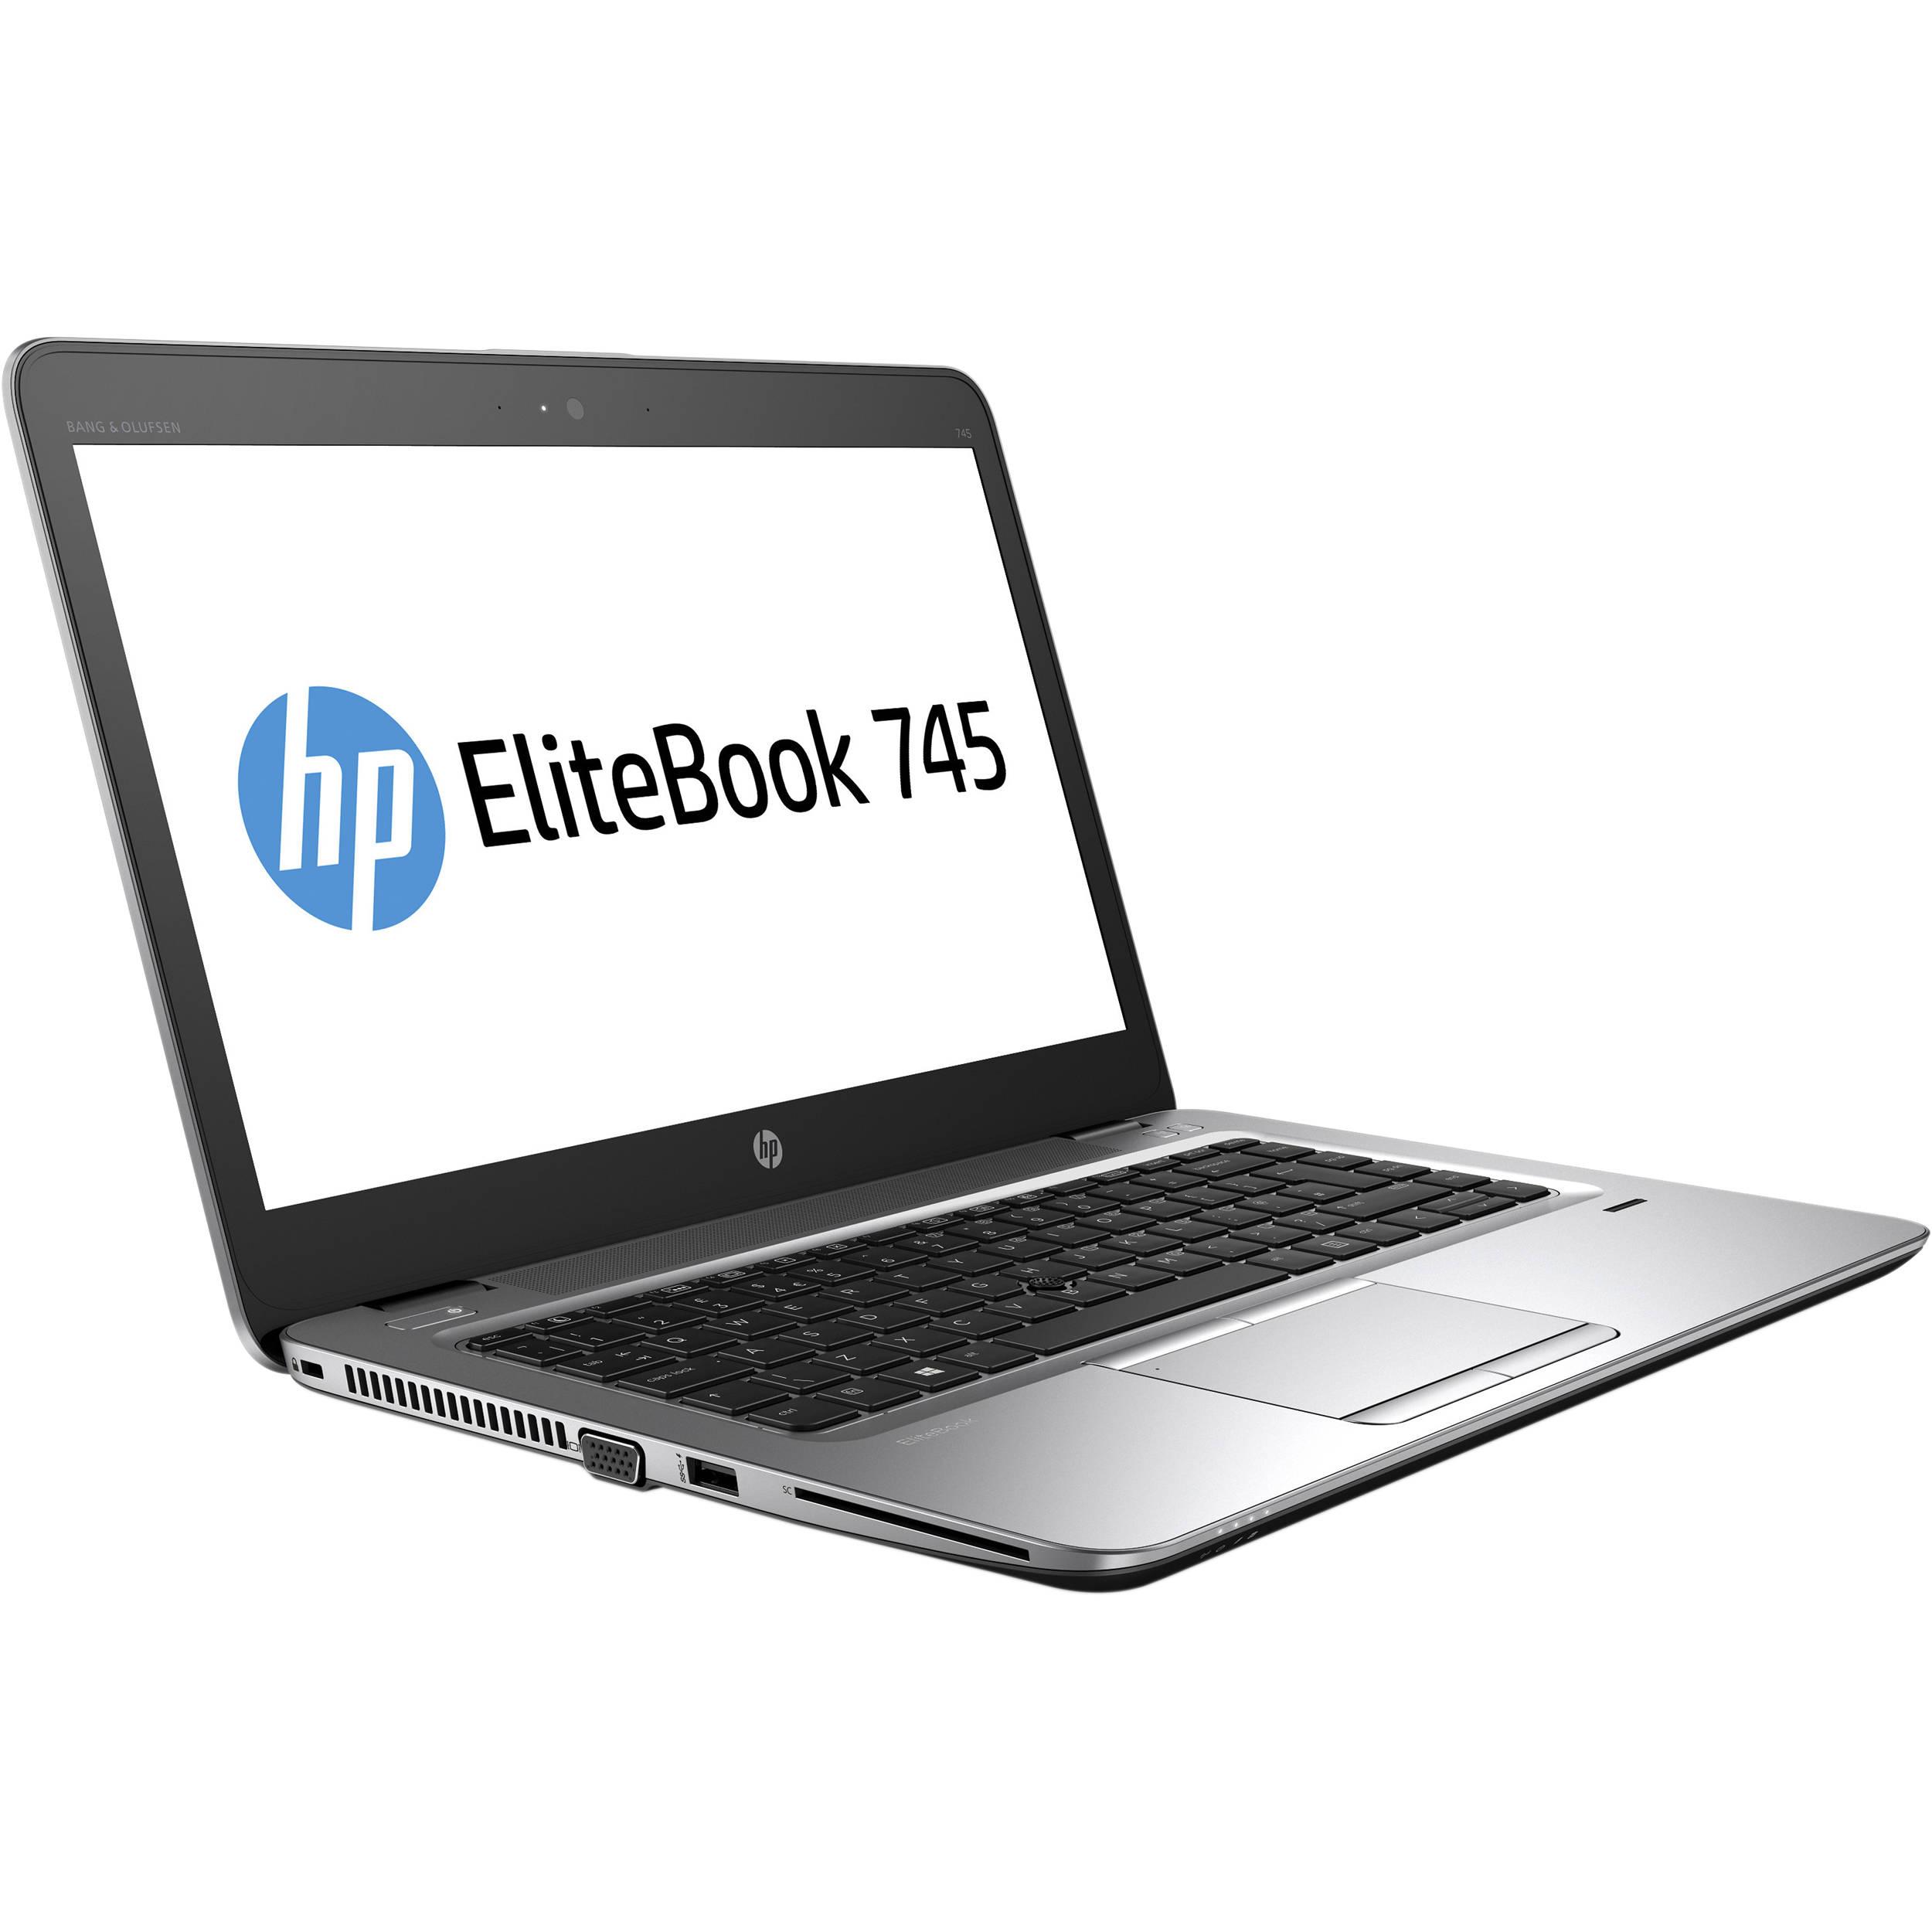 HP Mini 100-1125NR Notebook Broadcom Decoder Card Windows 8 X64